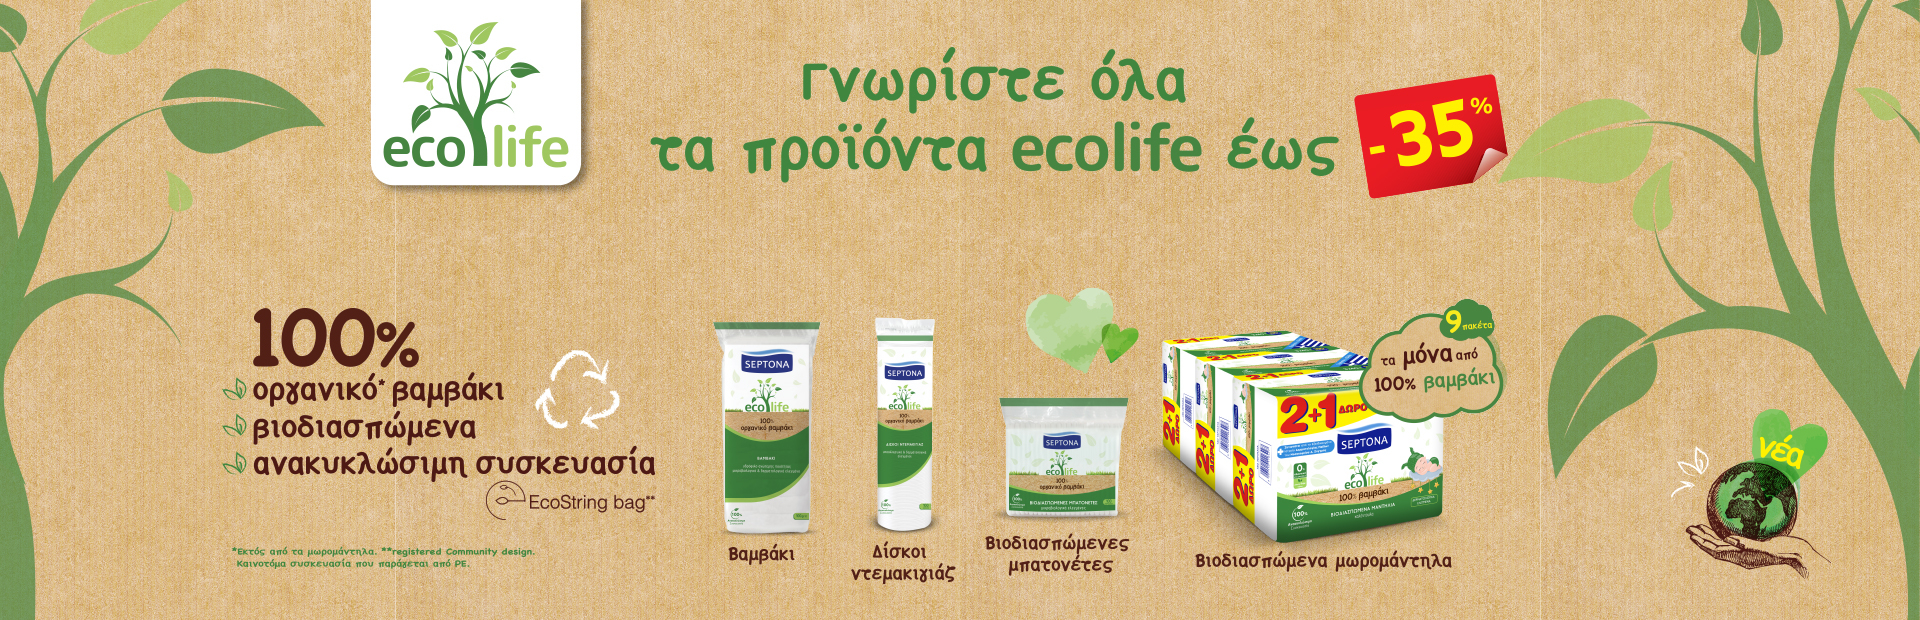 Septona Eco life